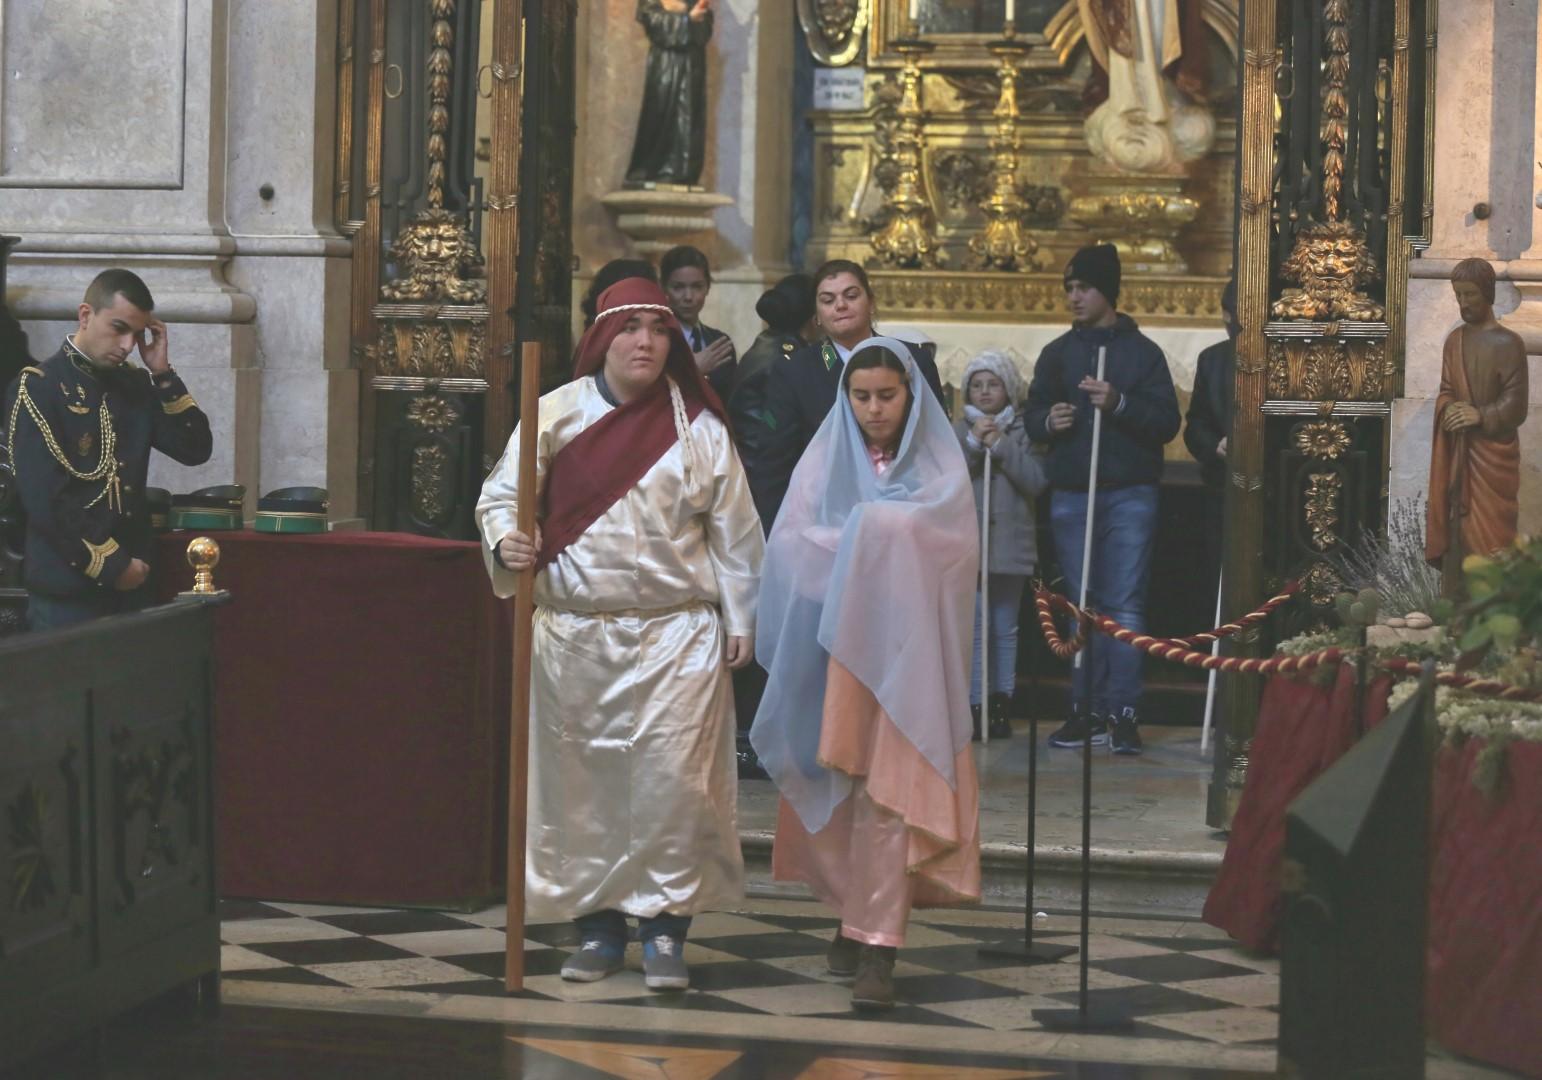 Igreja dos Martires_Missa de Natal da GNR